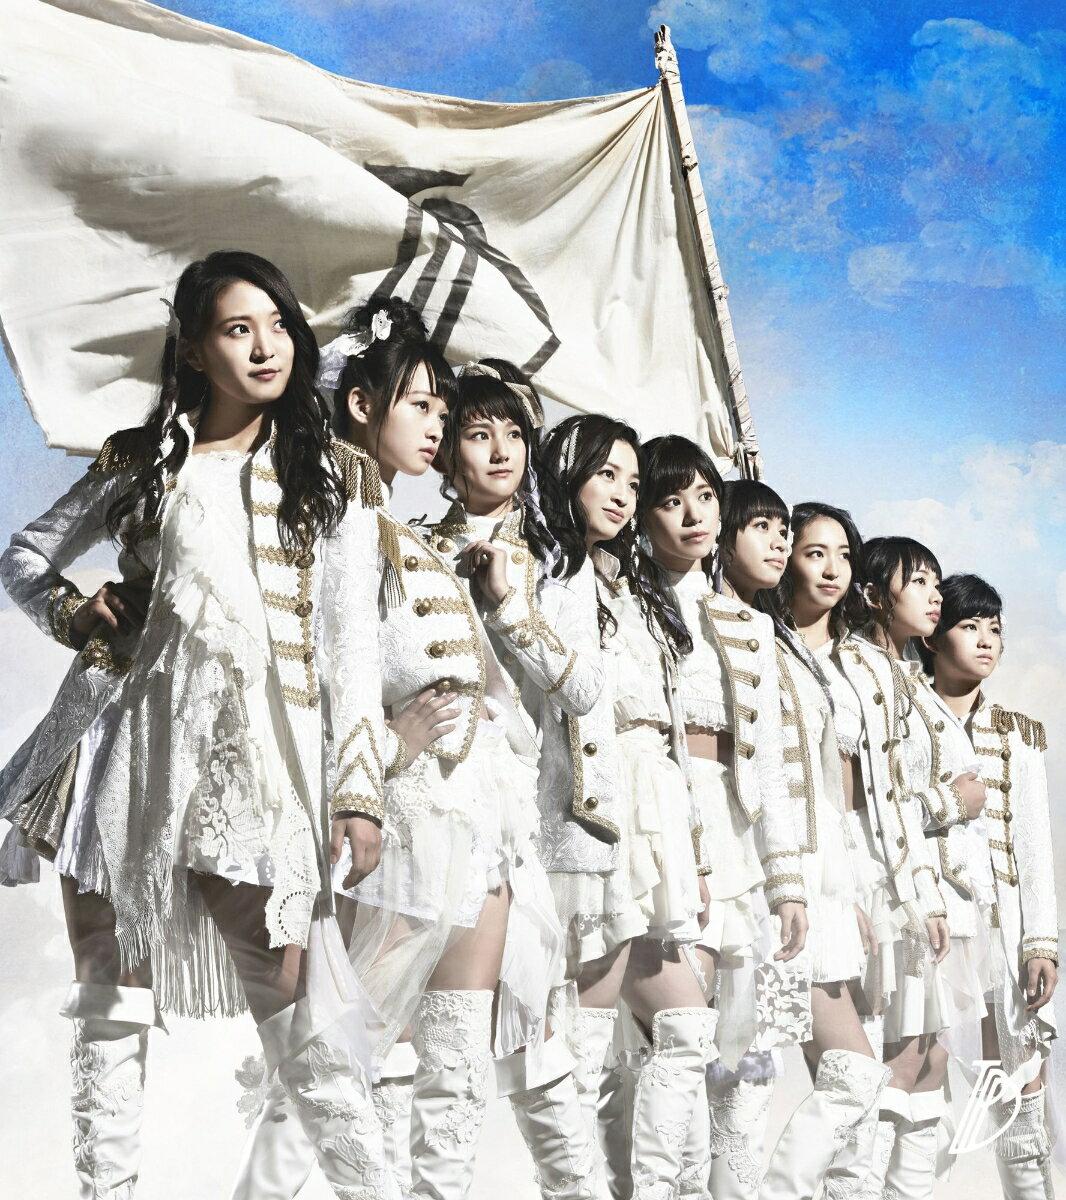 WE ARE TPD (初回限定盤C 2CD) [ 東京パフォーマンスドール ]